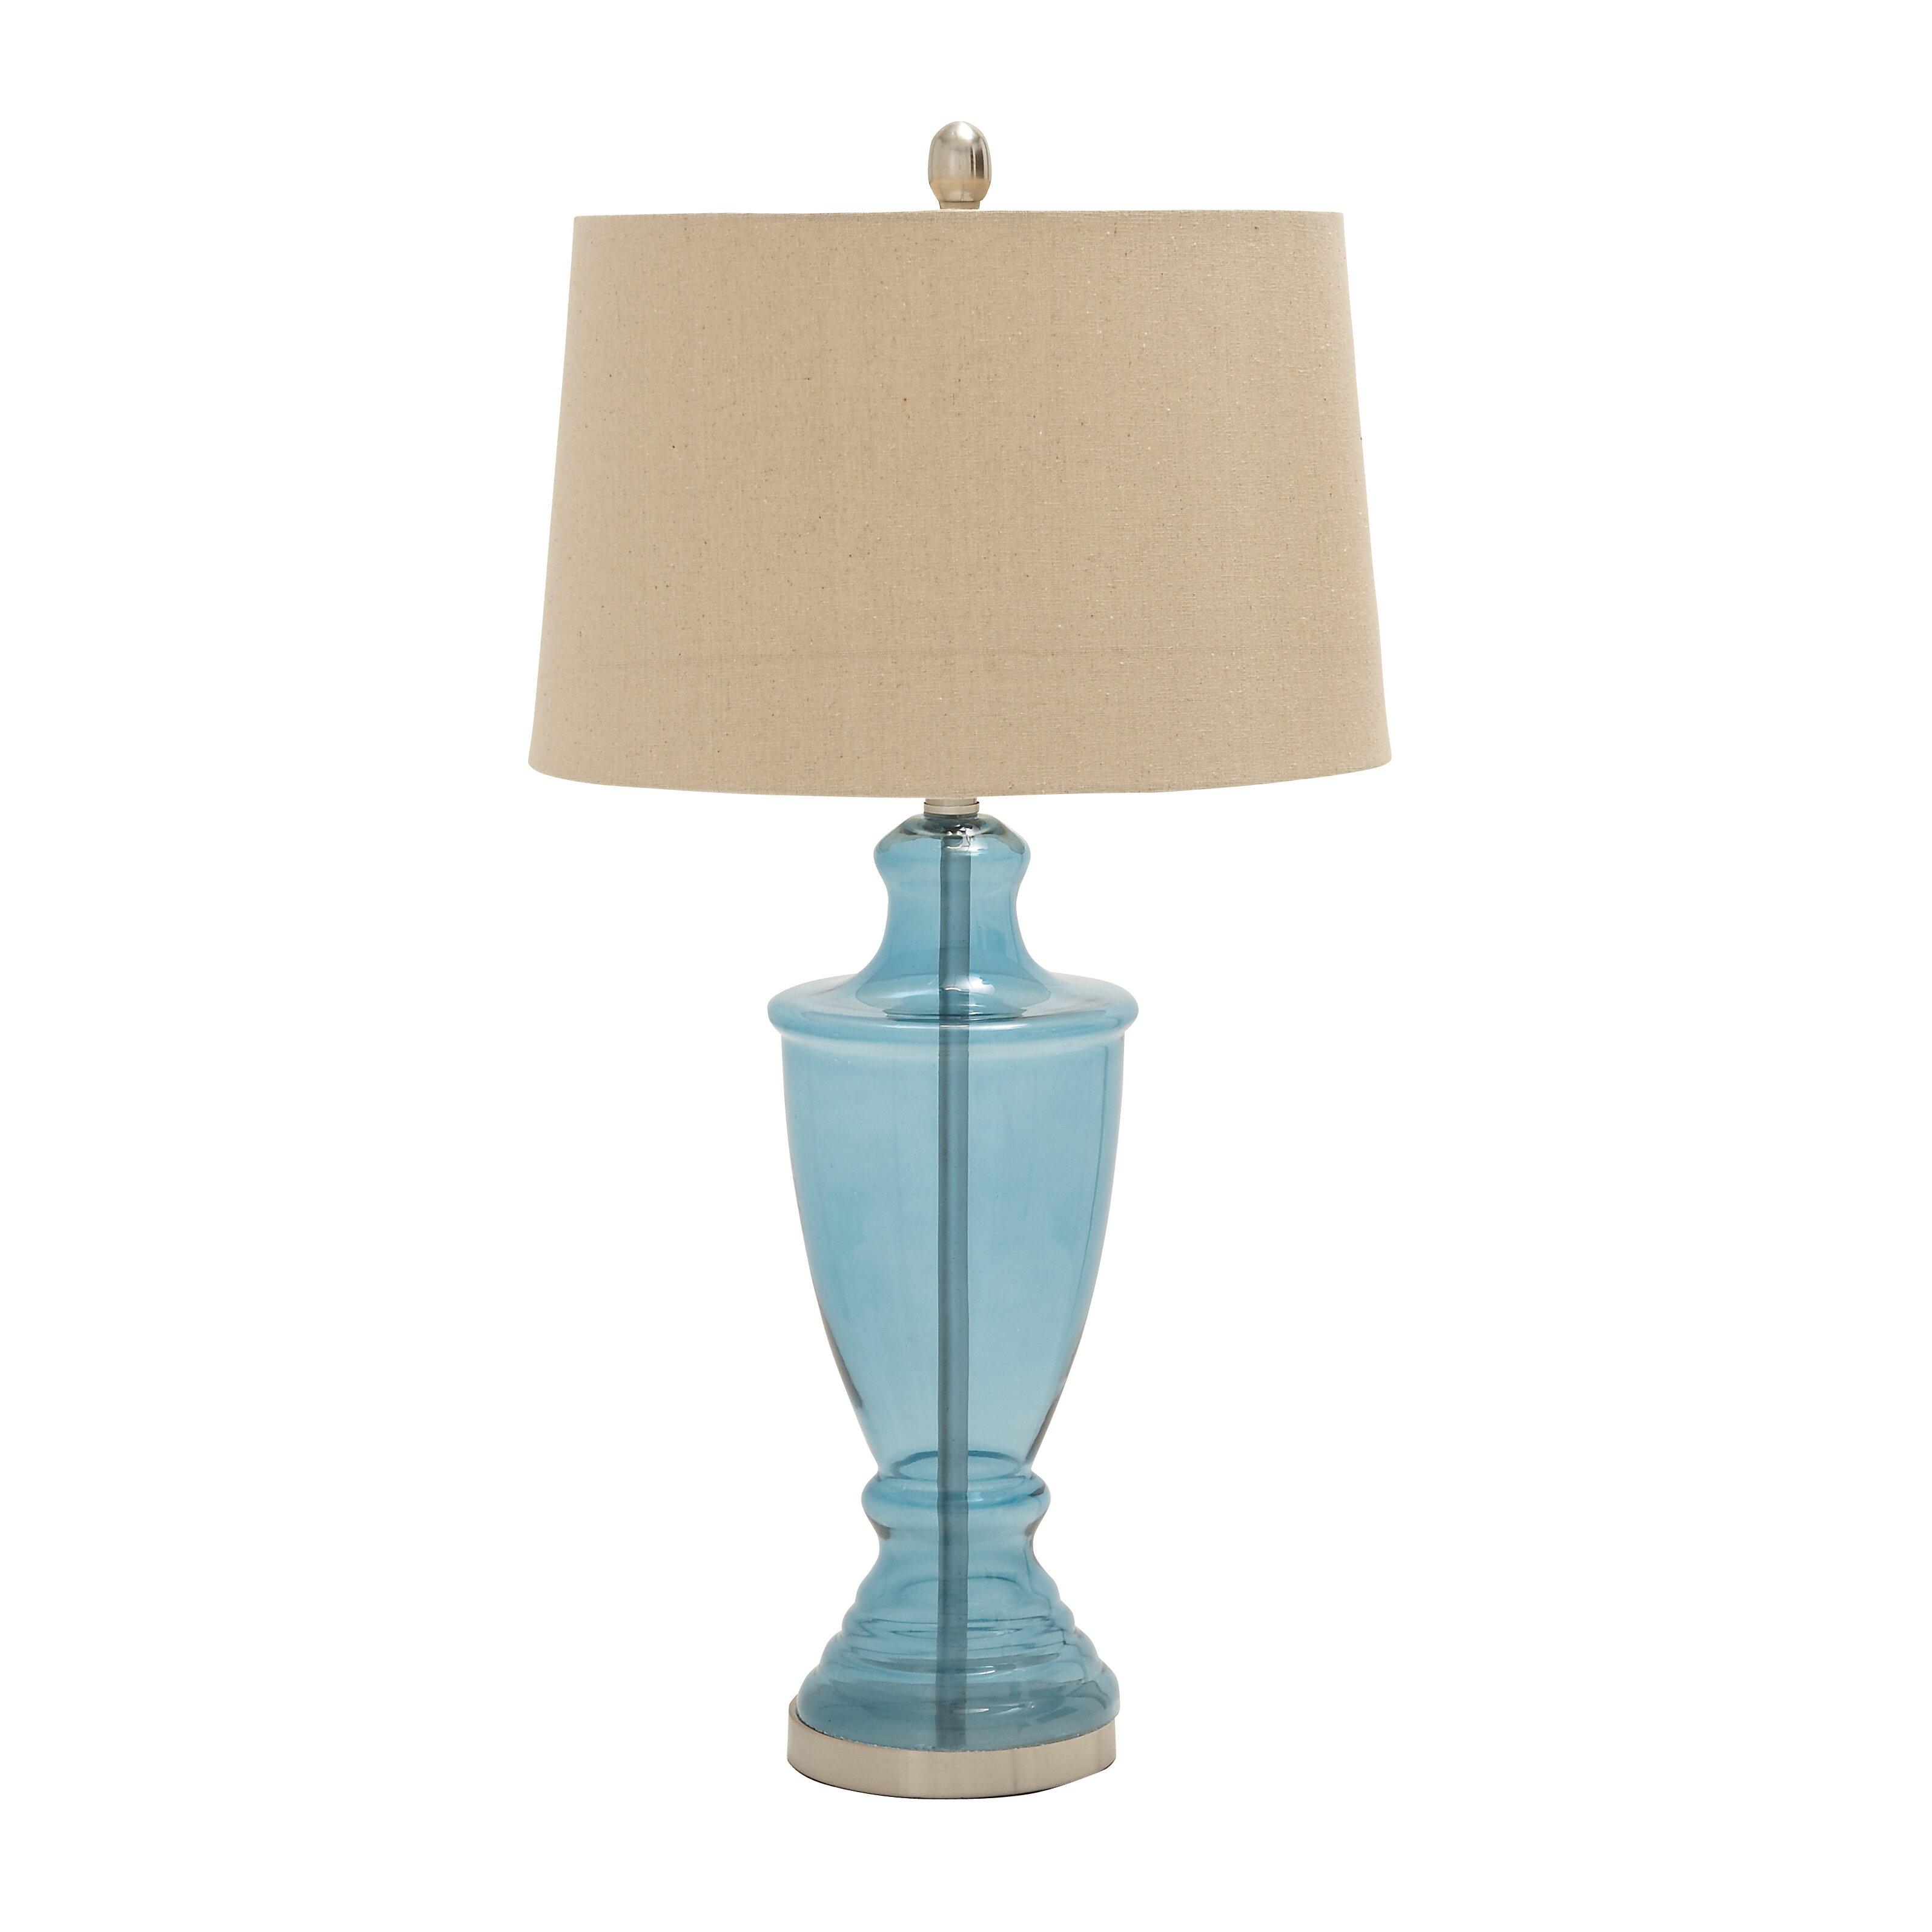 Woodland Imports Stunning And Elegant 31 Table Lamp